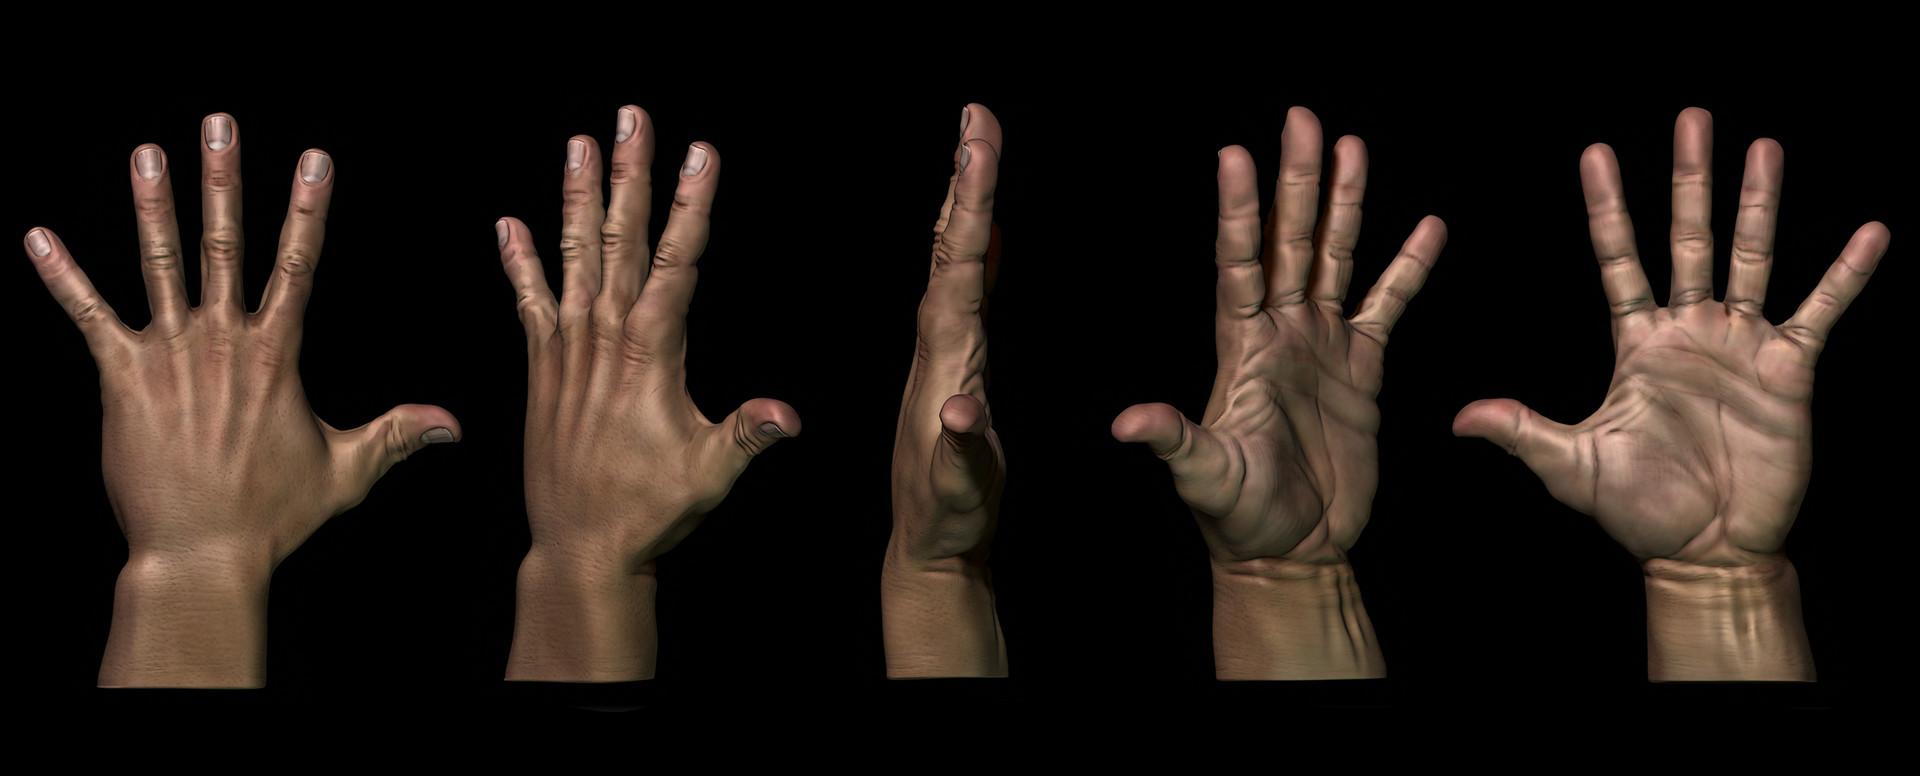 ArtStation - Hand anatomy, Jaime Asins Ferrandiz